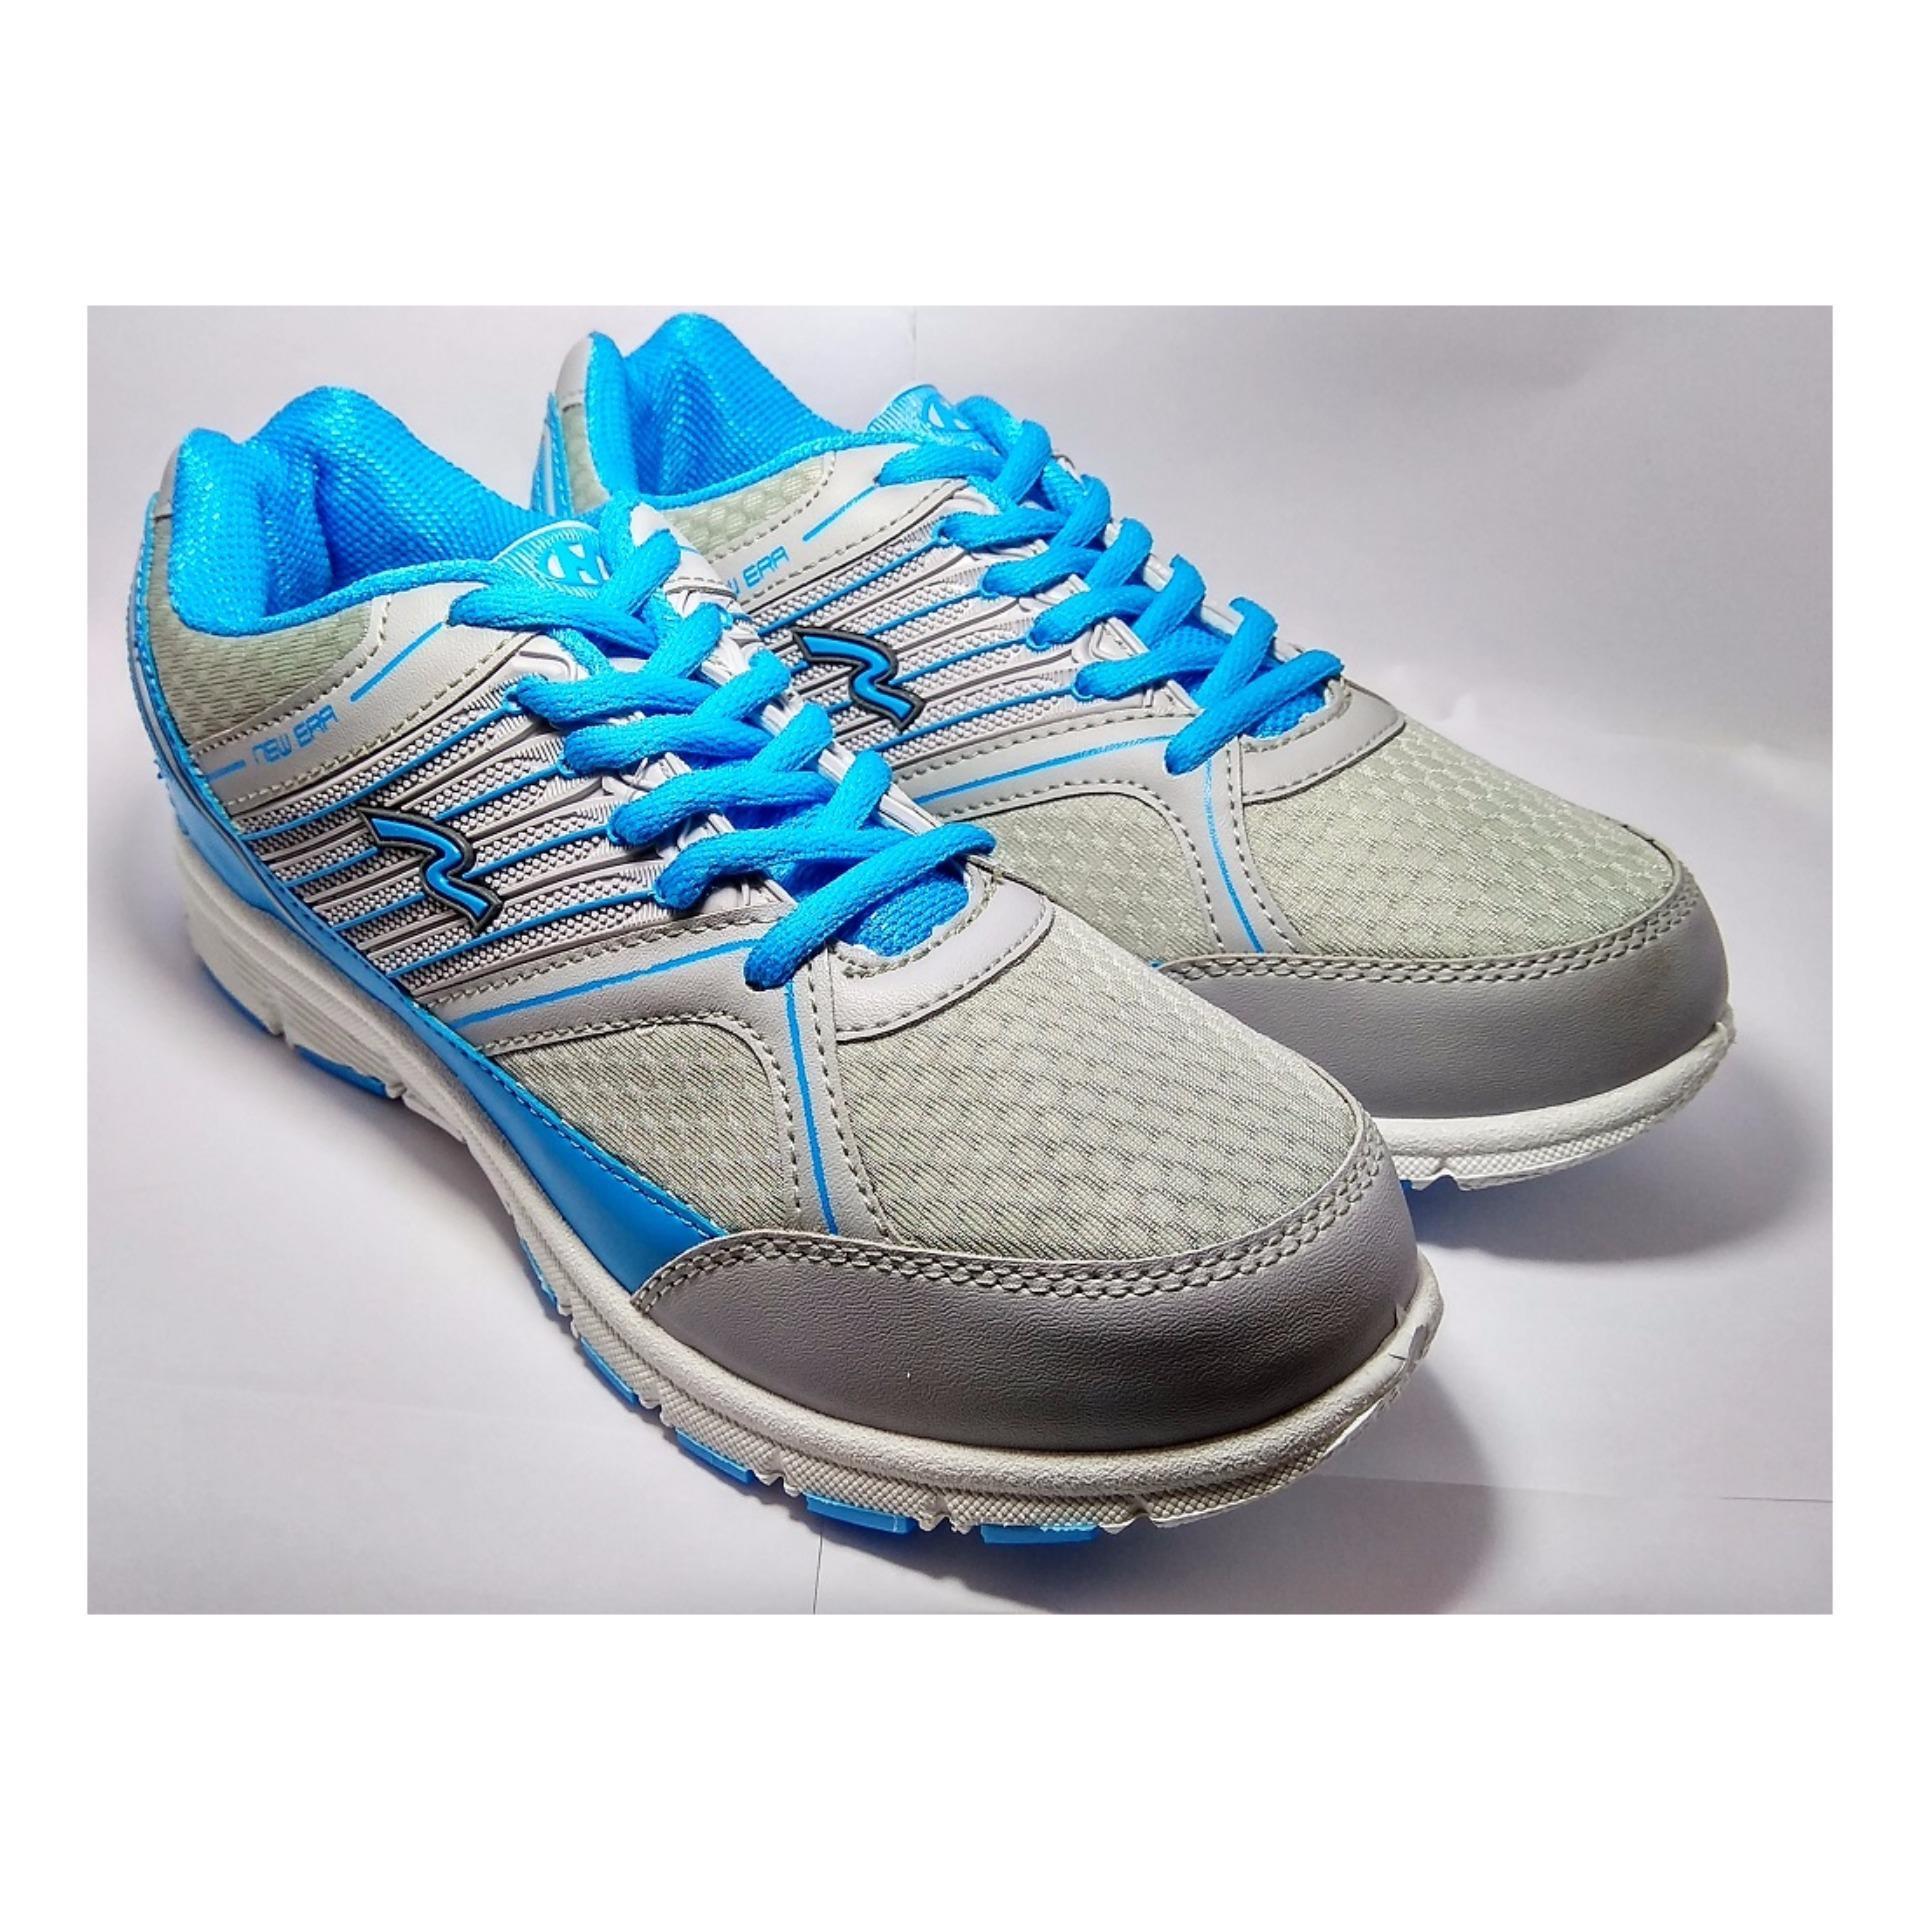 Beli New Era Princes 37 40 Sepatu Sport Wanita Cicilan